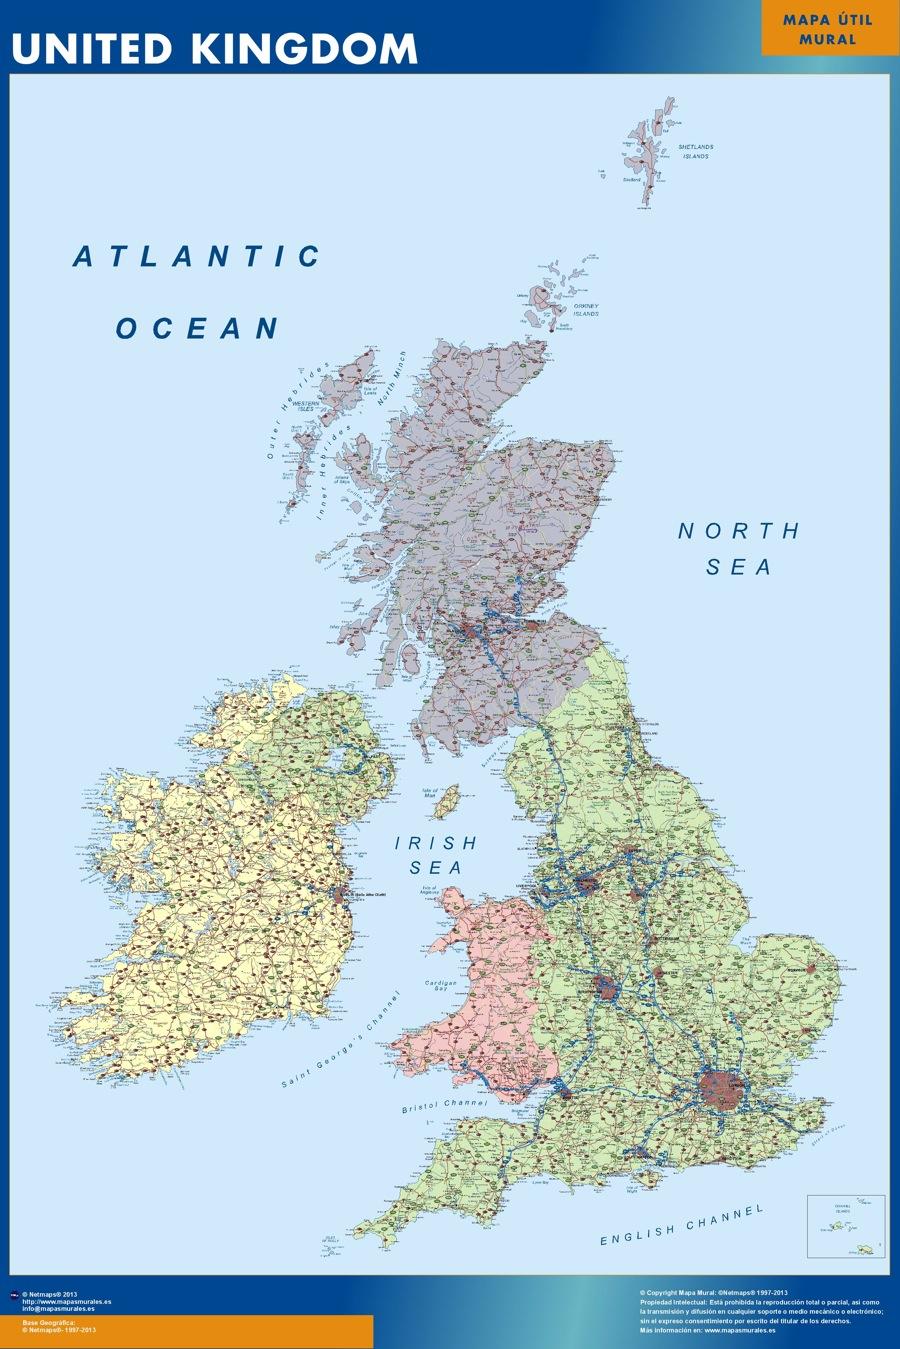 mapa carreteras reino unido